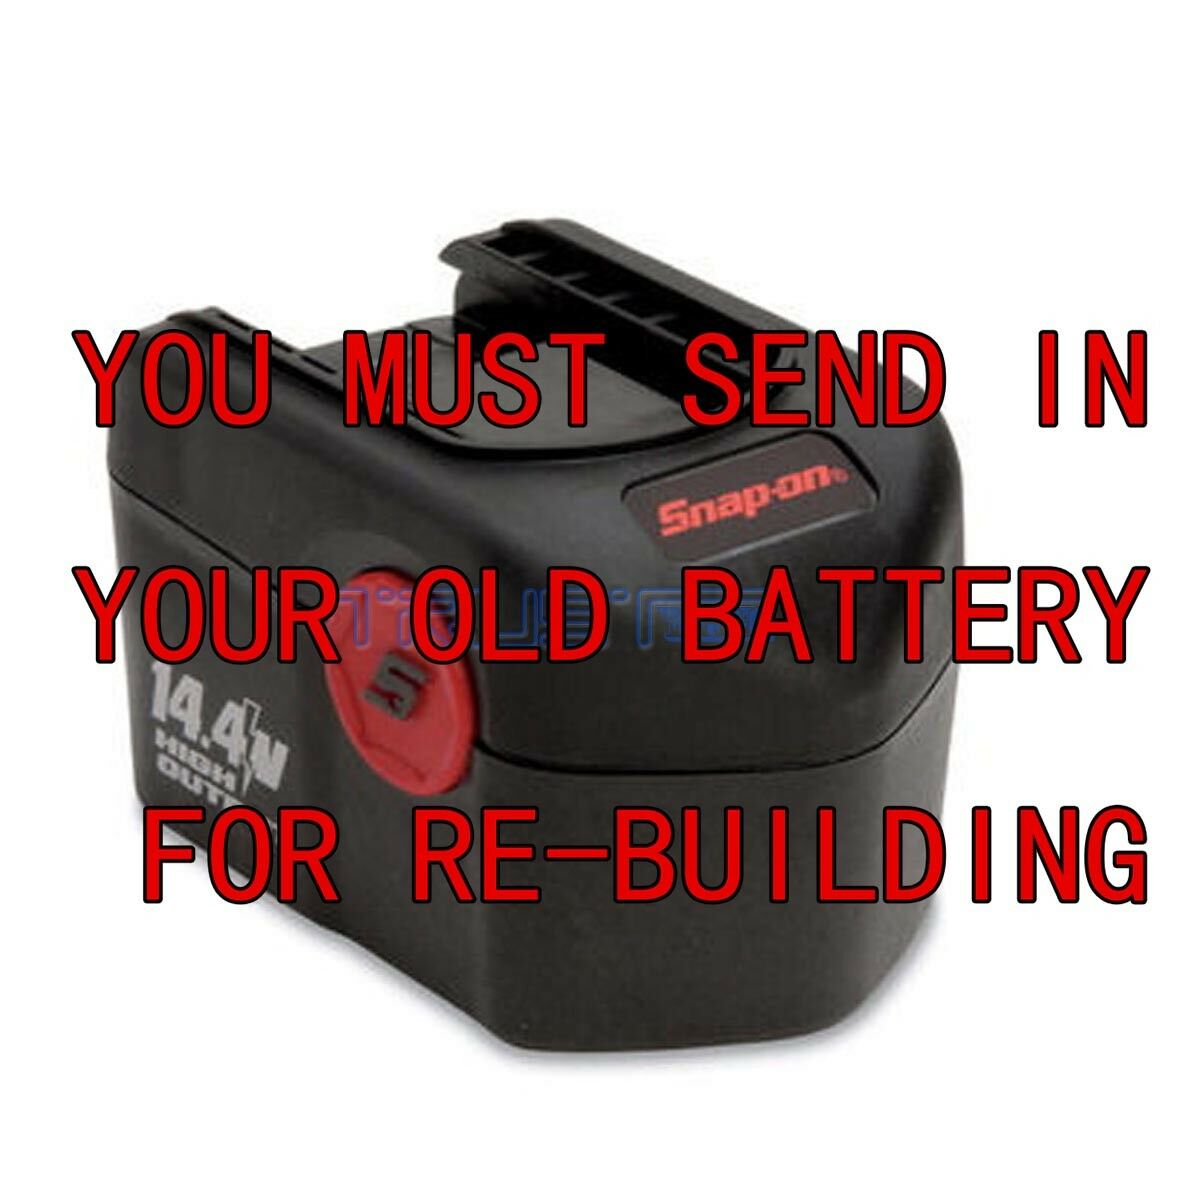 We Rebuild All 14.4 For Snap-On batteries 3.0AH NIMH CTB4147 CTB4145